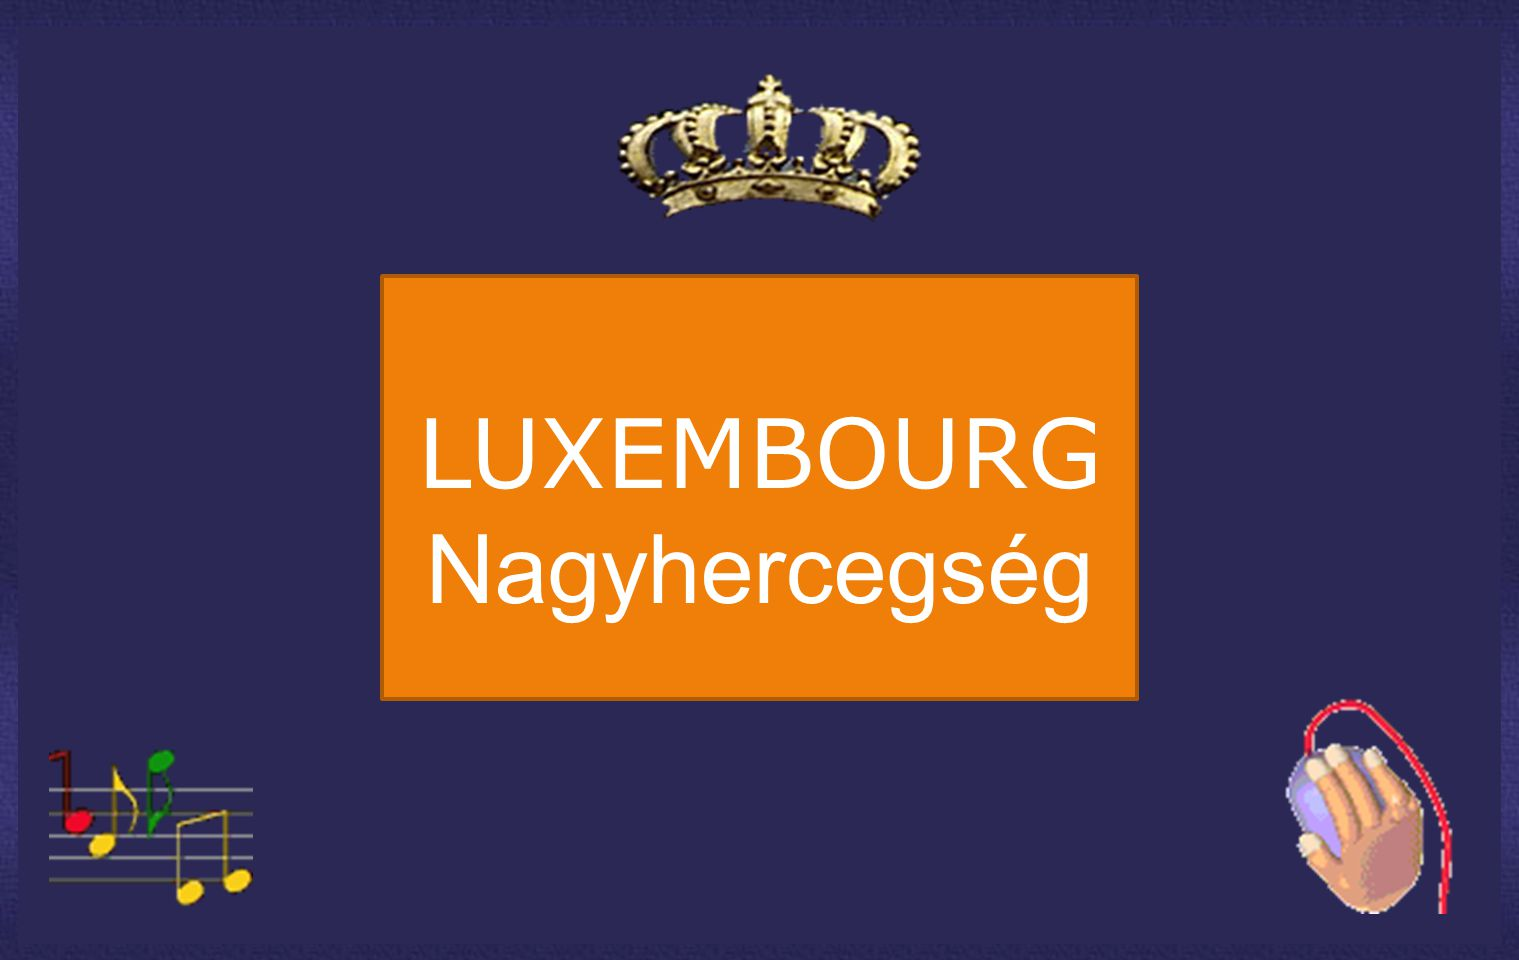 LUXEMBOURG Nagyhercegség